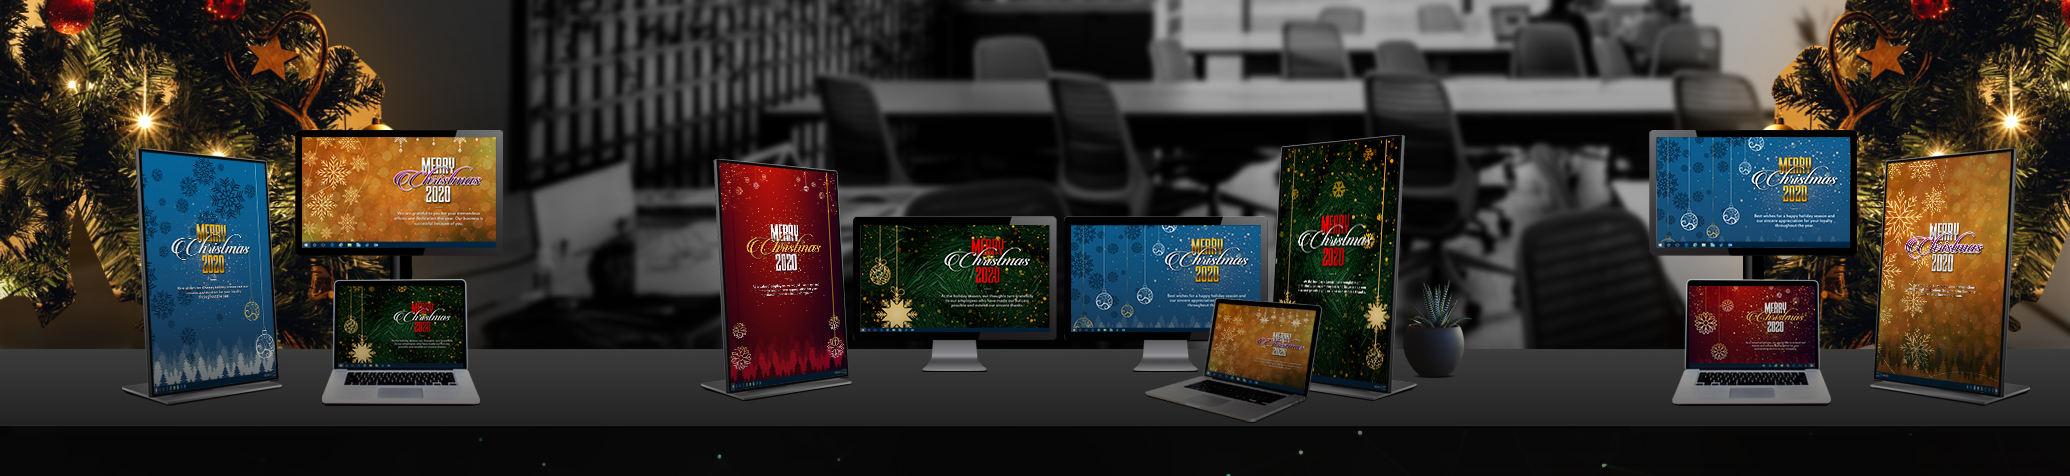 Desktop Christmas wallpaper